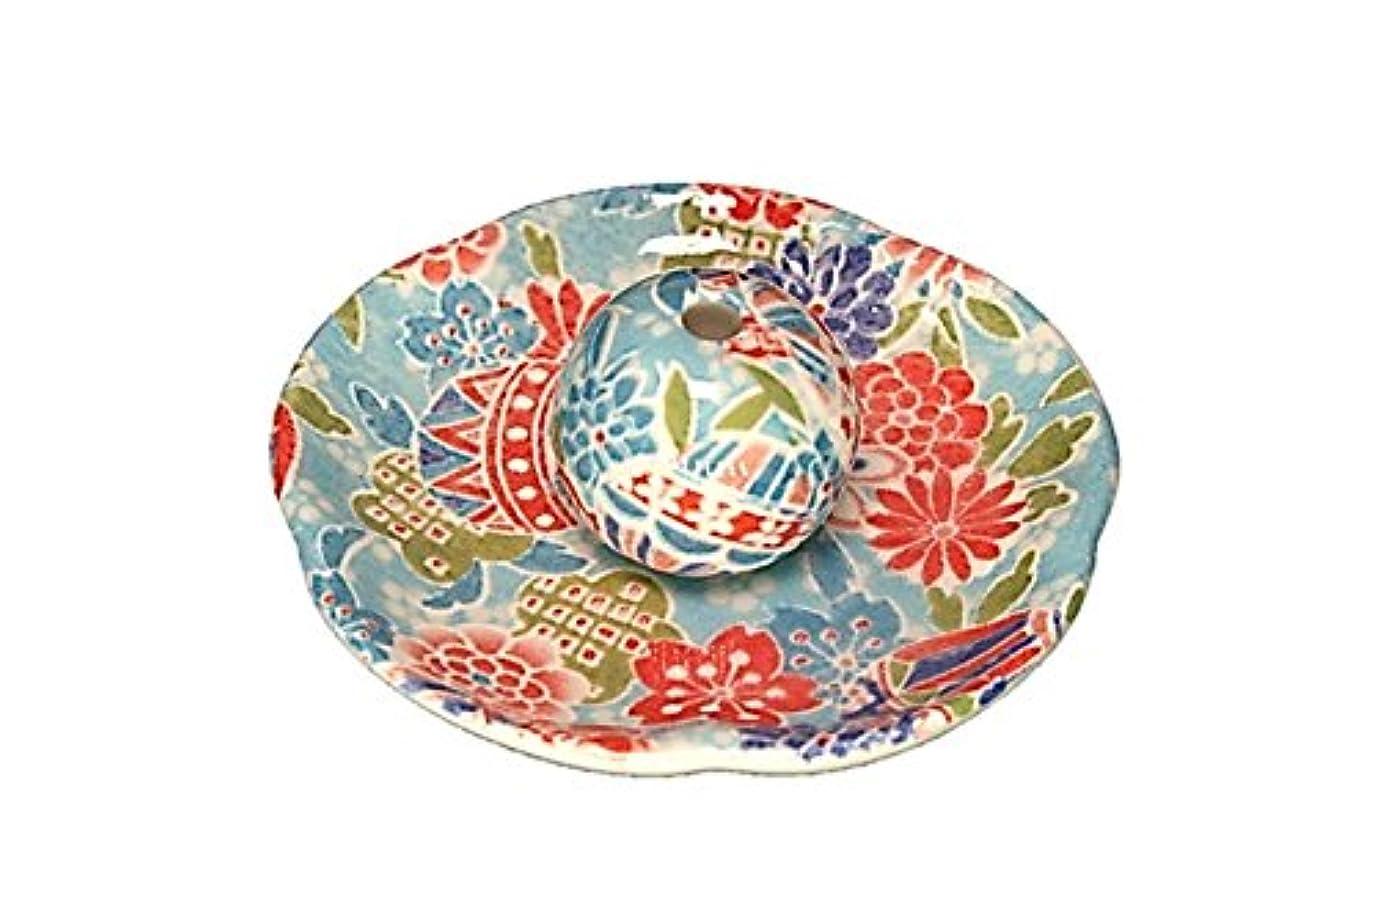 京雅 青 花形香皿 お香立て 日本製 製造 直売